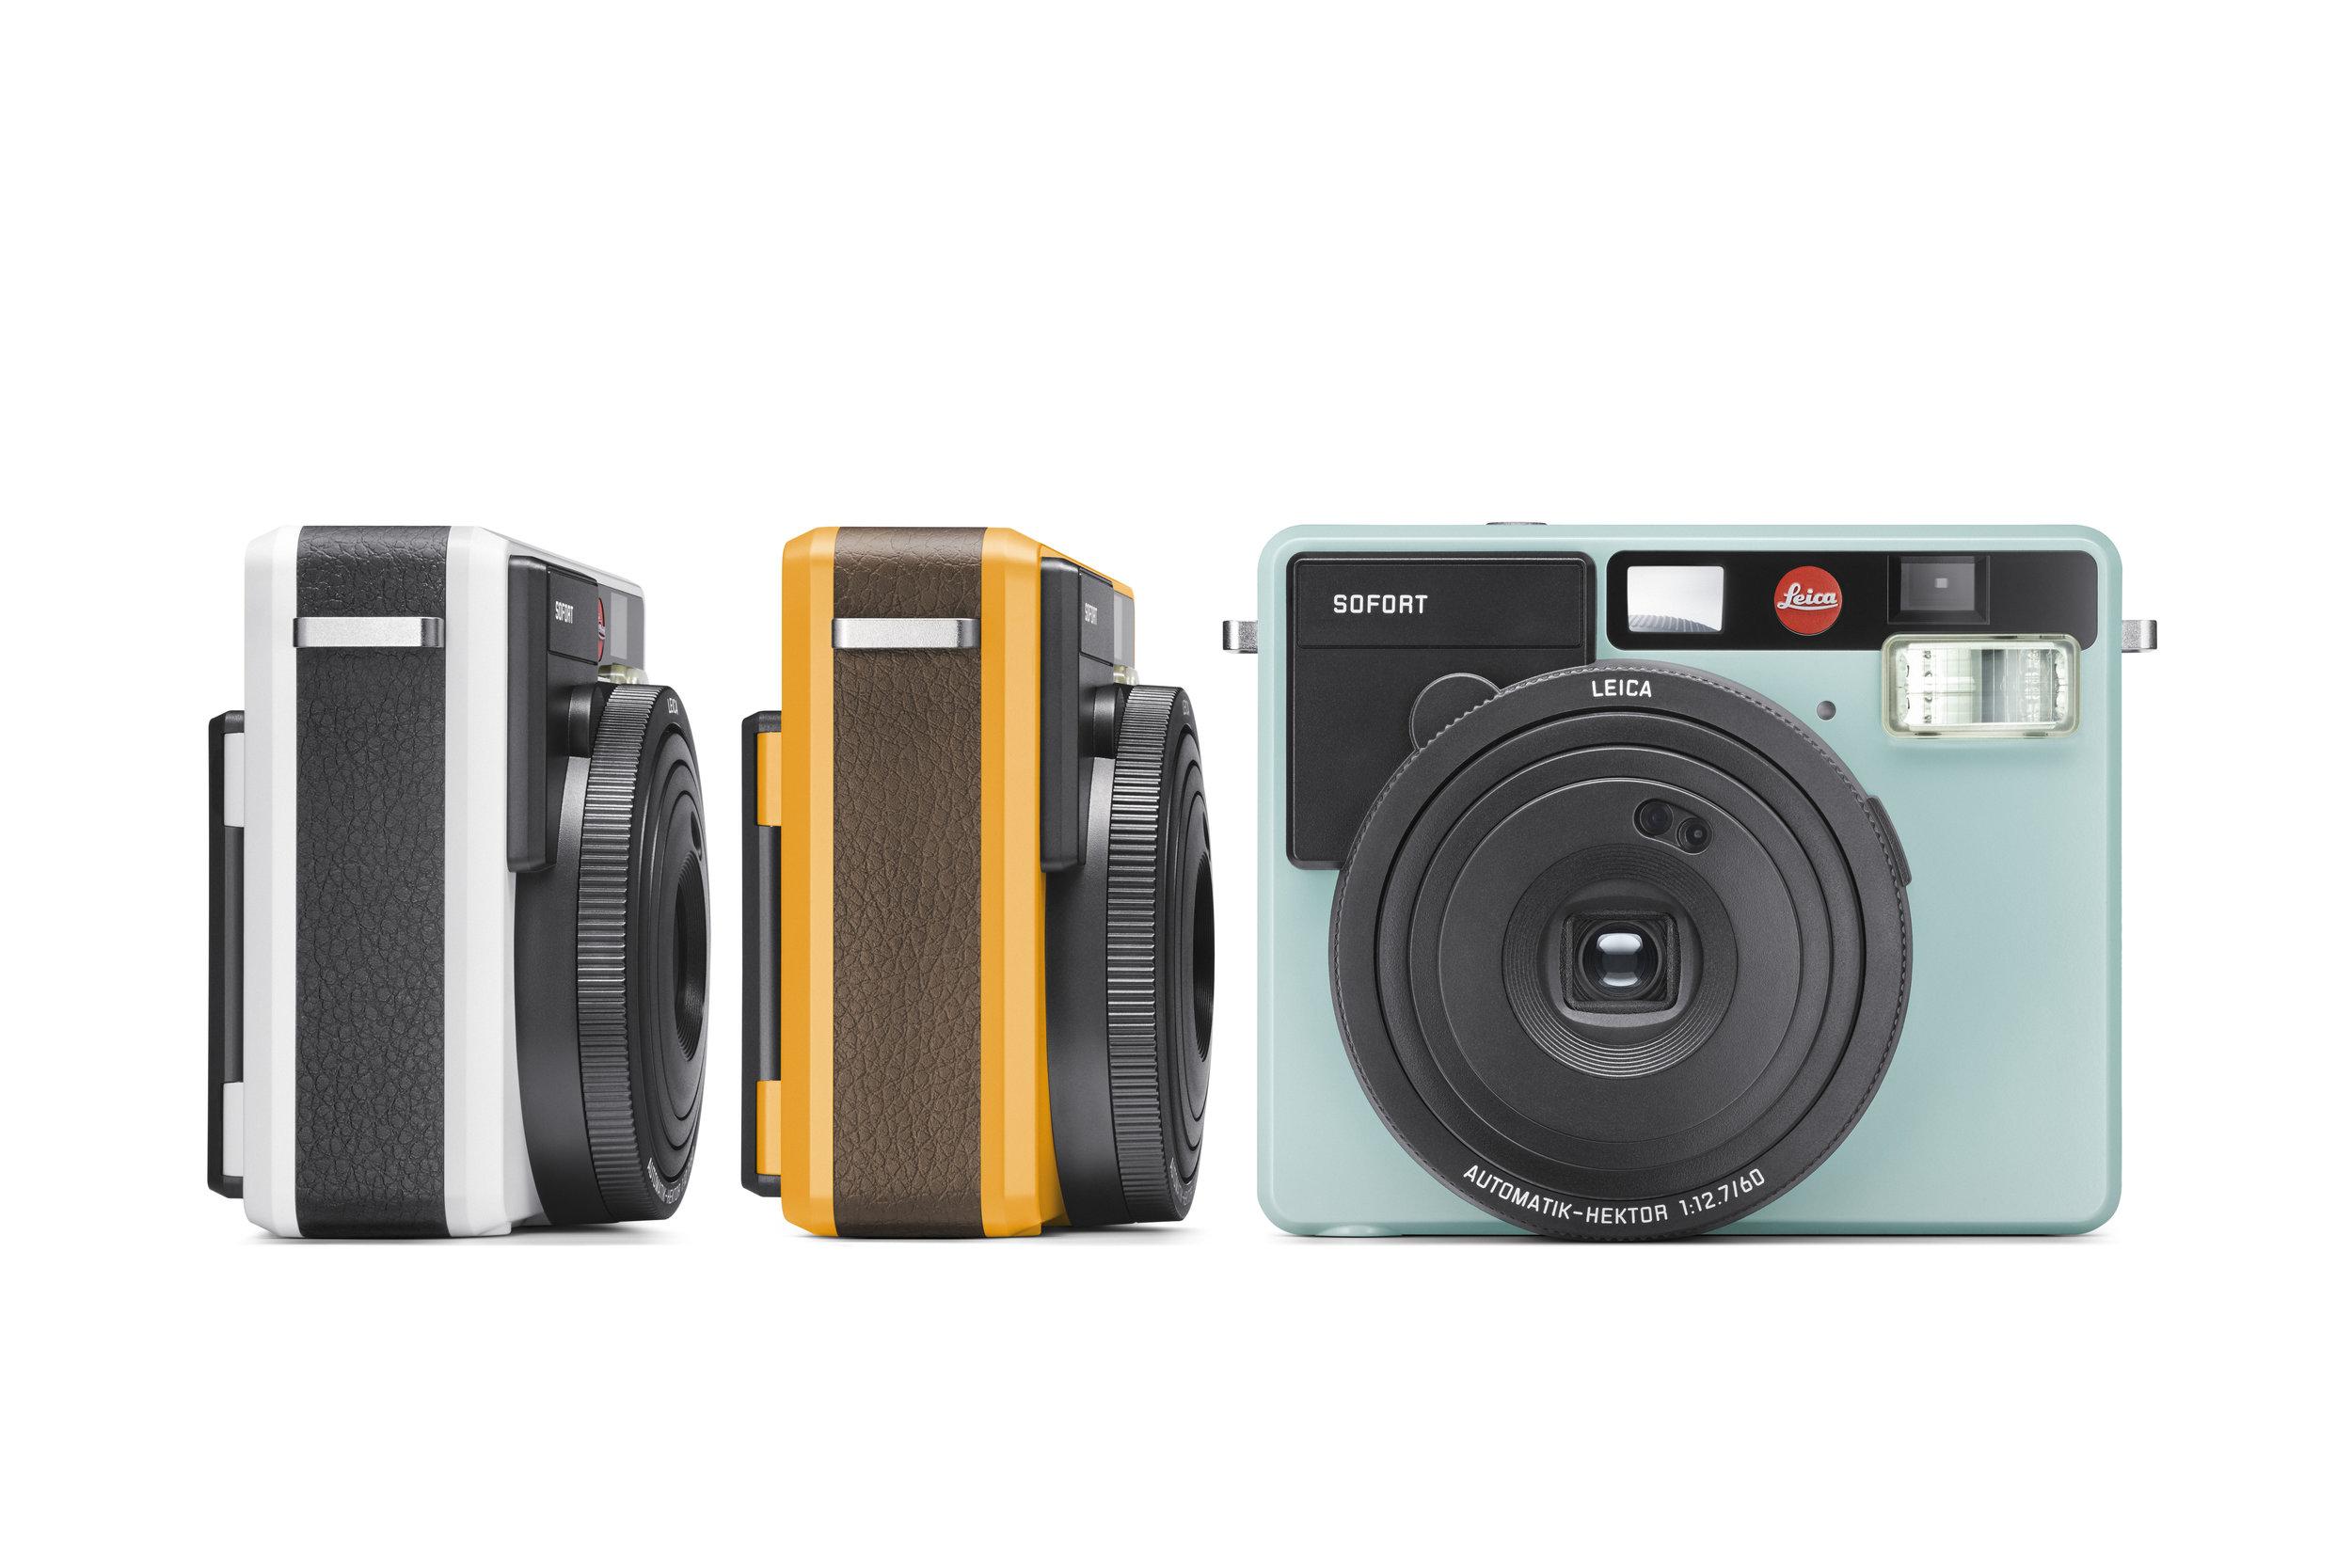 Leica+Sofort_Group.jpg